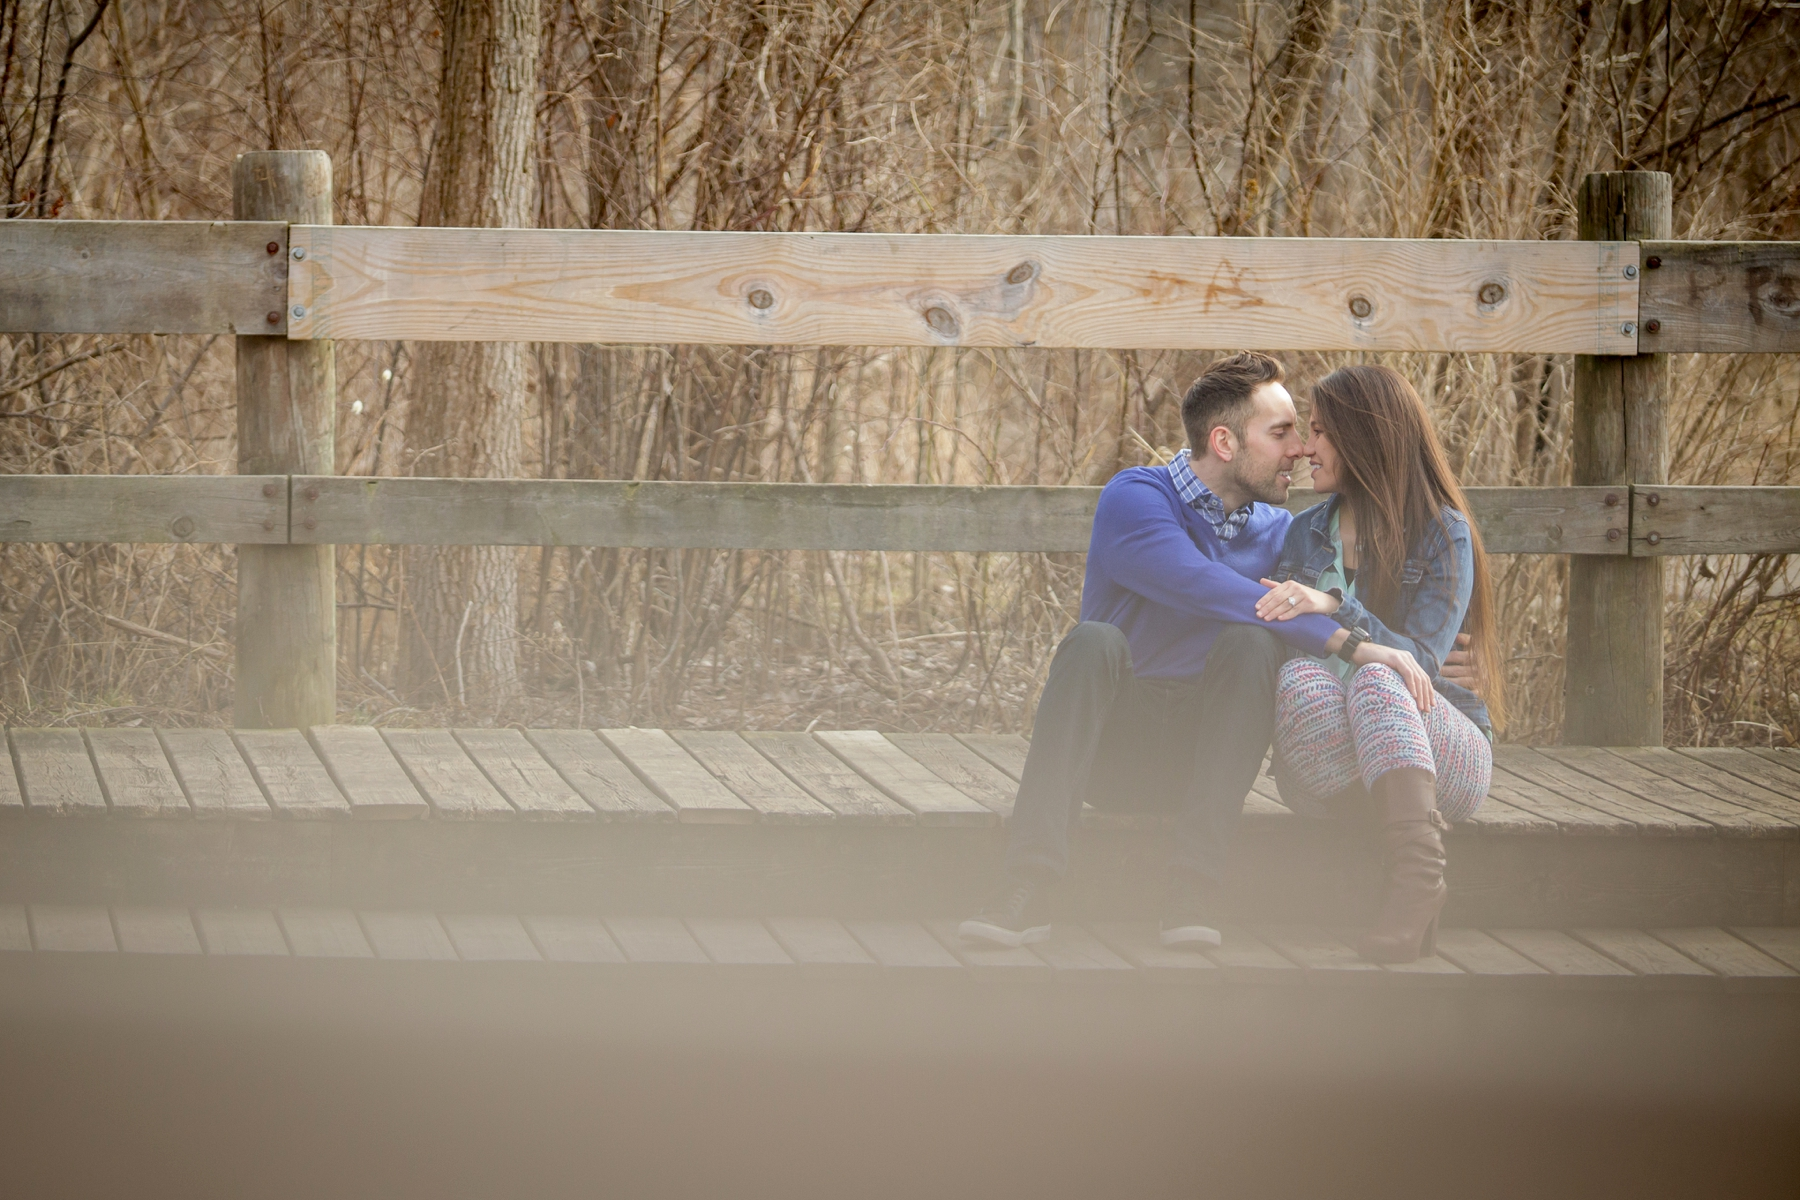 Brandon_Shafer_Photography_Kim_Nick_Engagement_0003.jpg